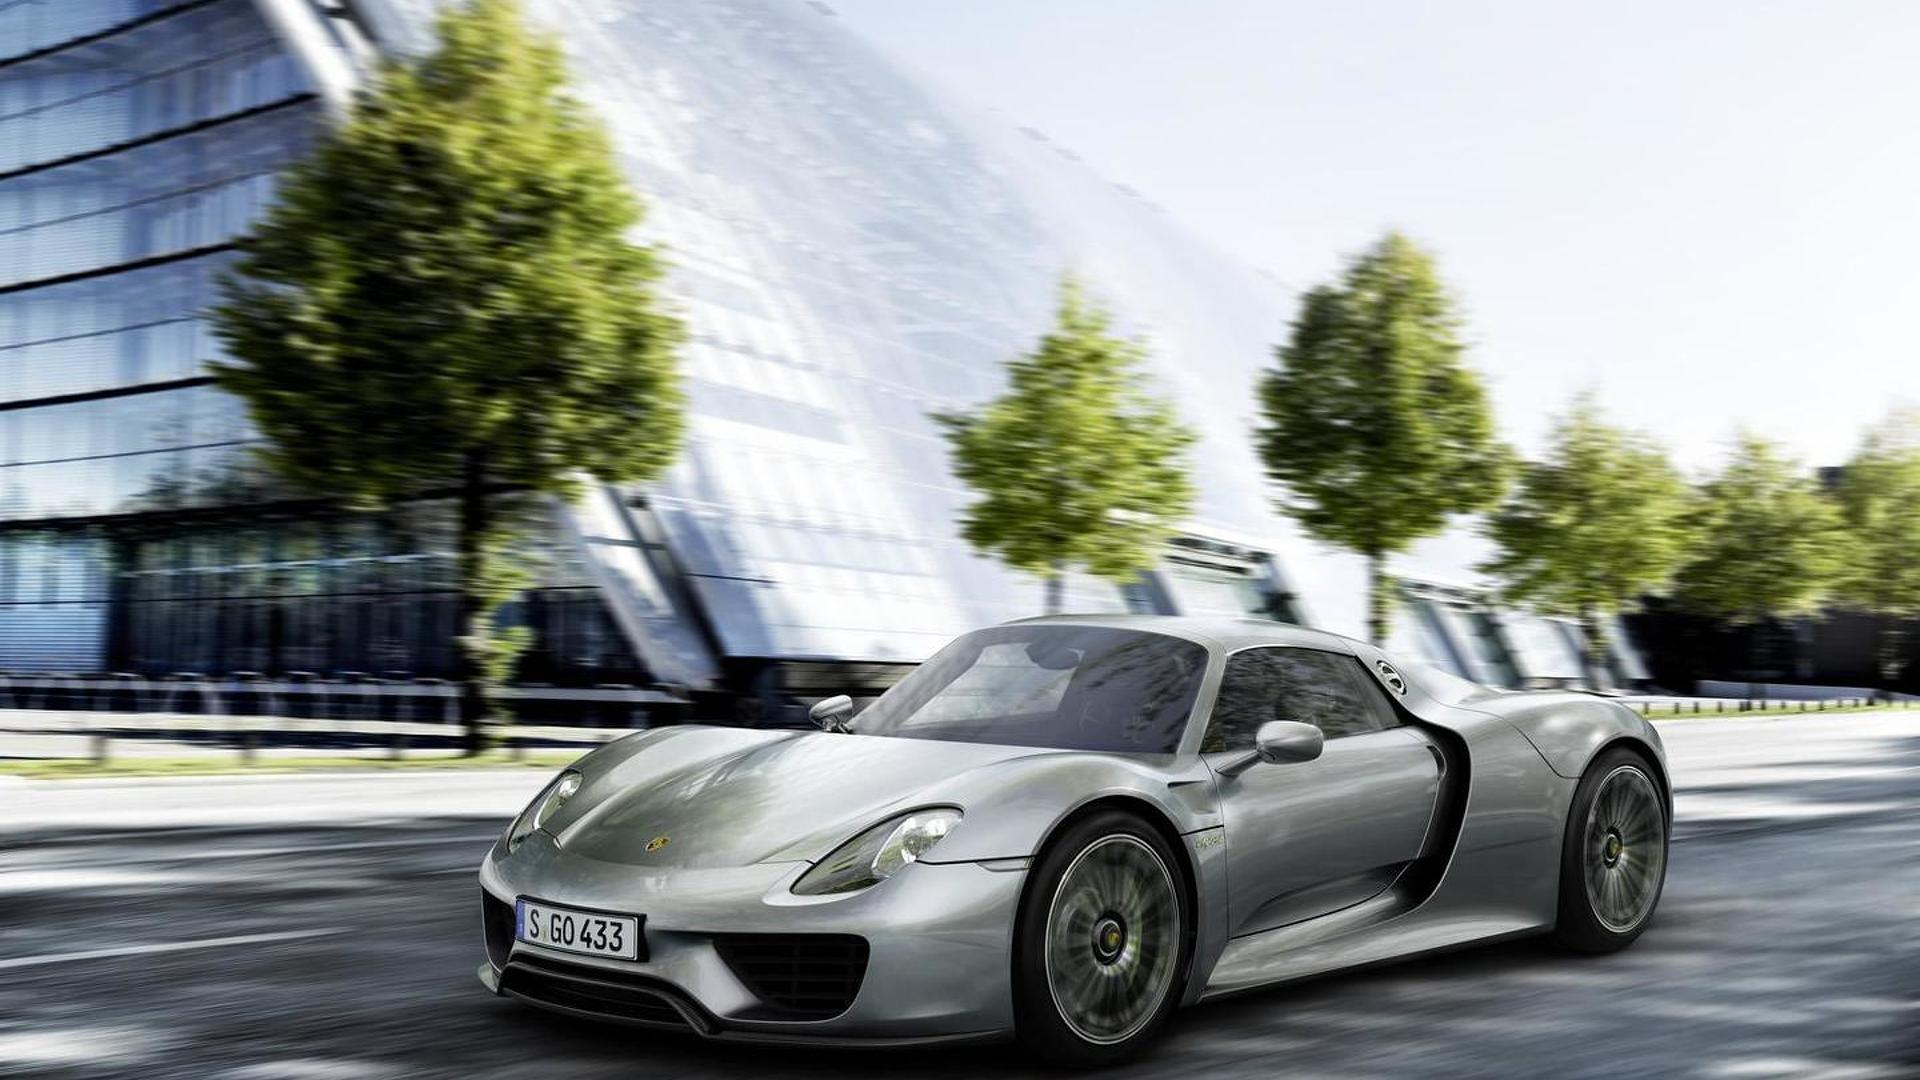 2013-409252-porsche-918-spyder-production-model1 Remarkable Porsche 918 Spyder On the Road Cars Trend